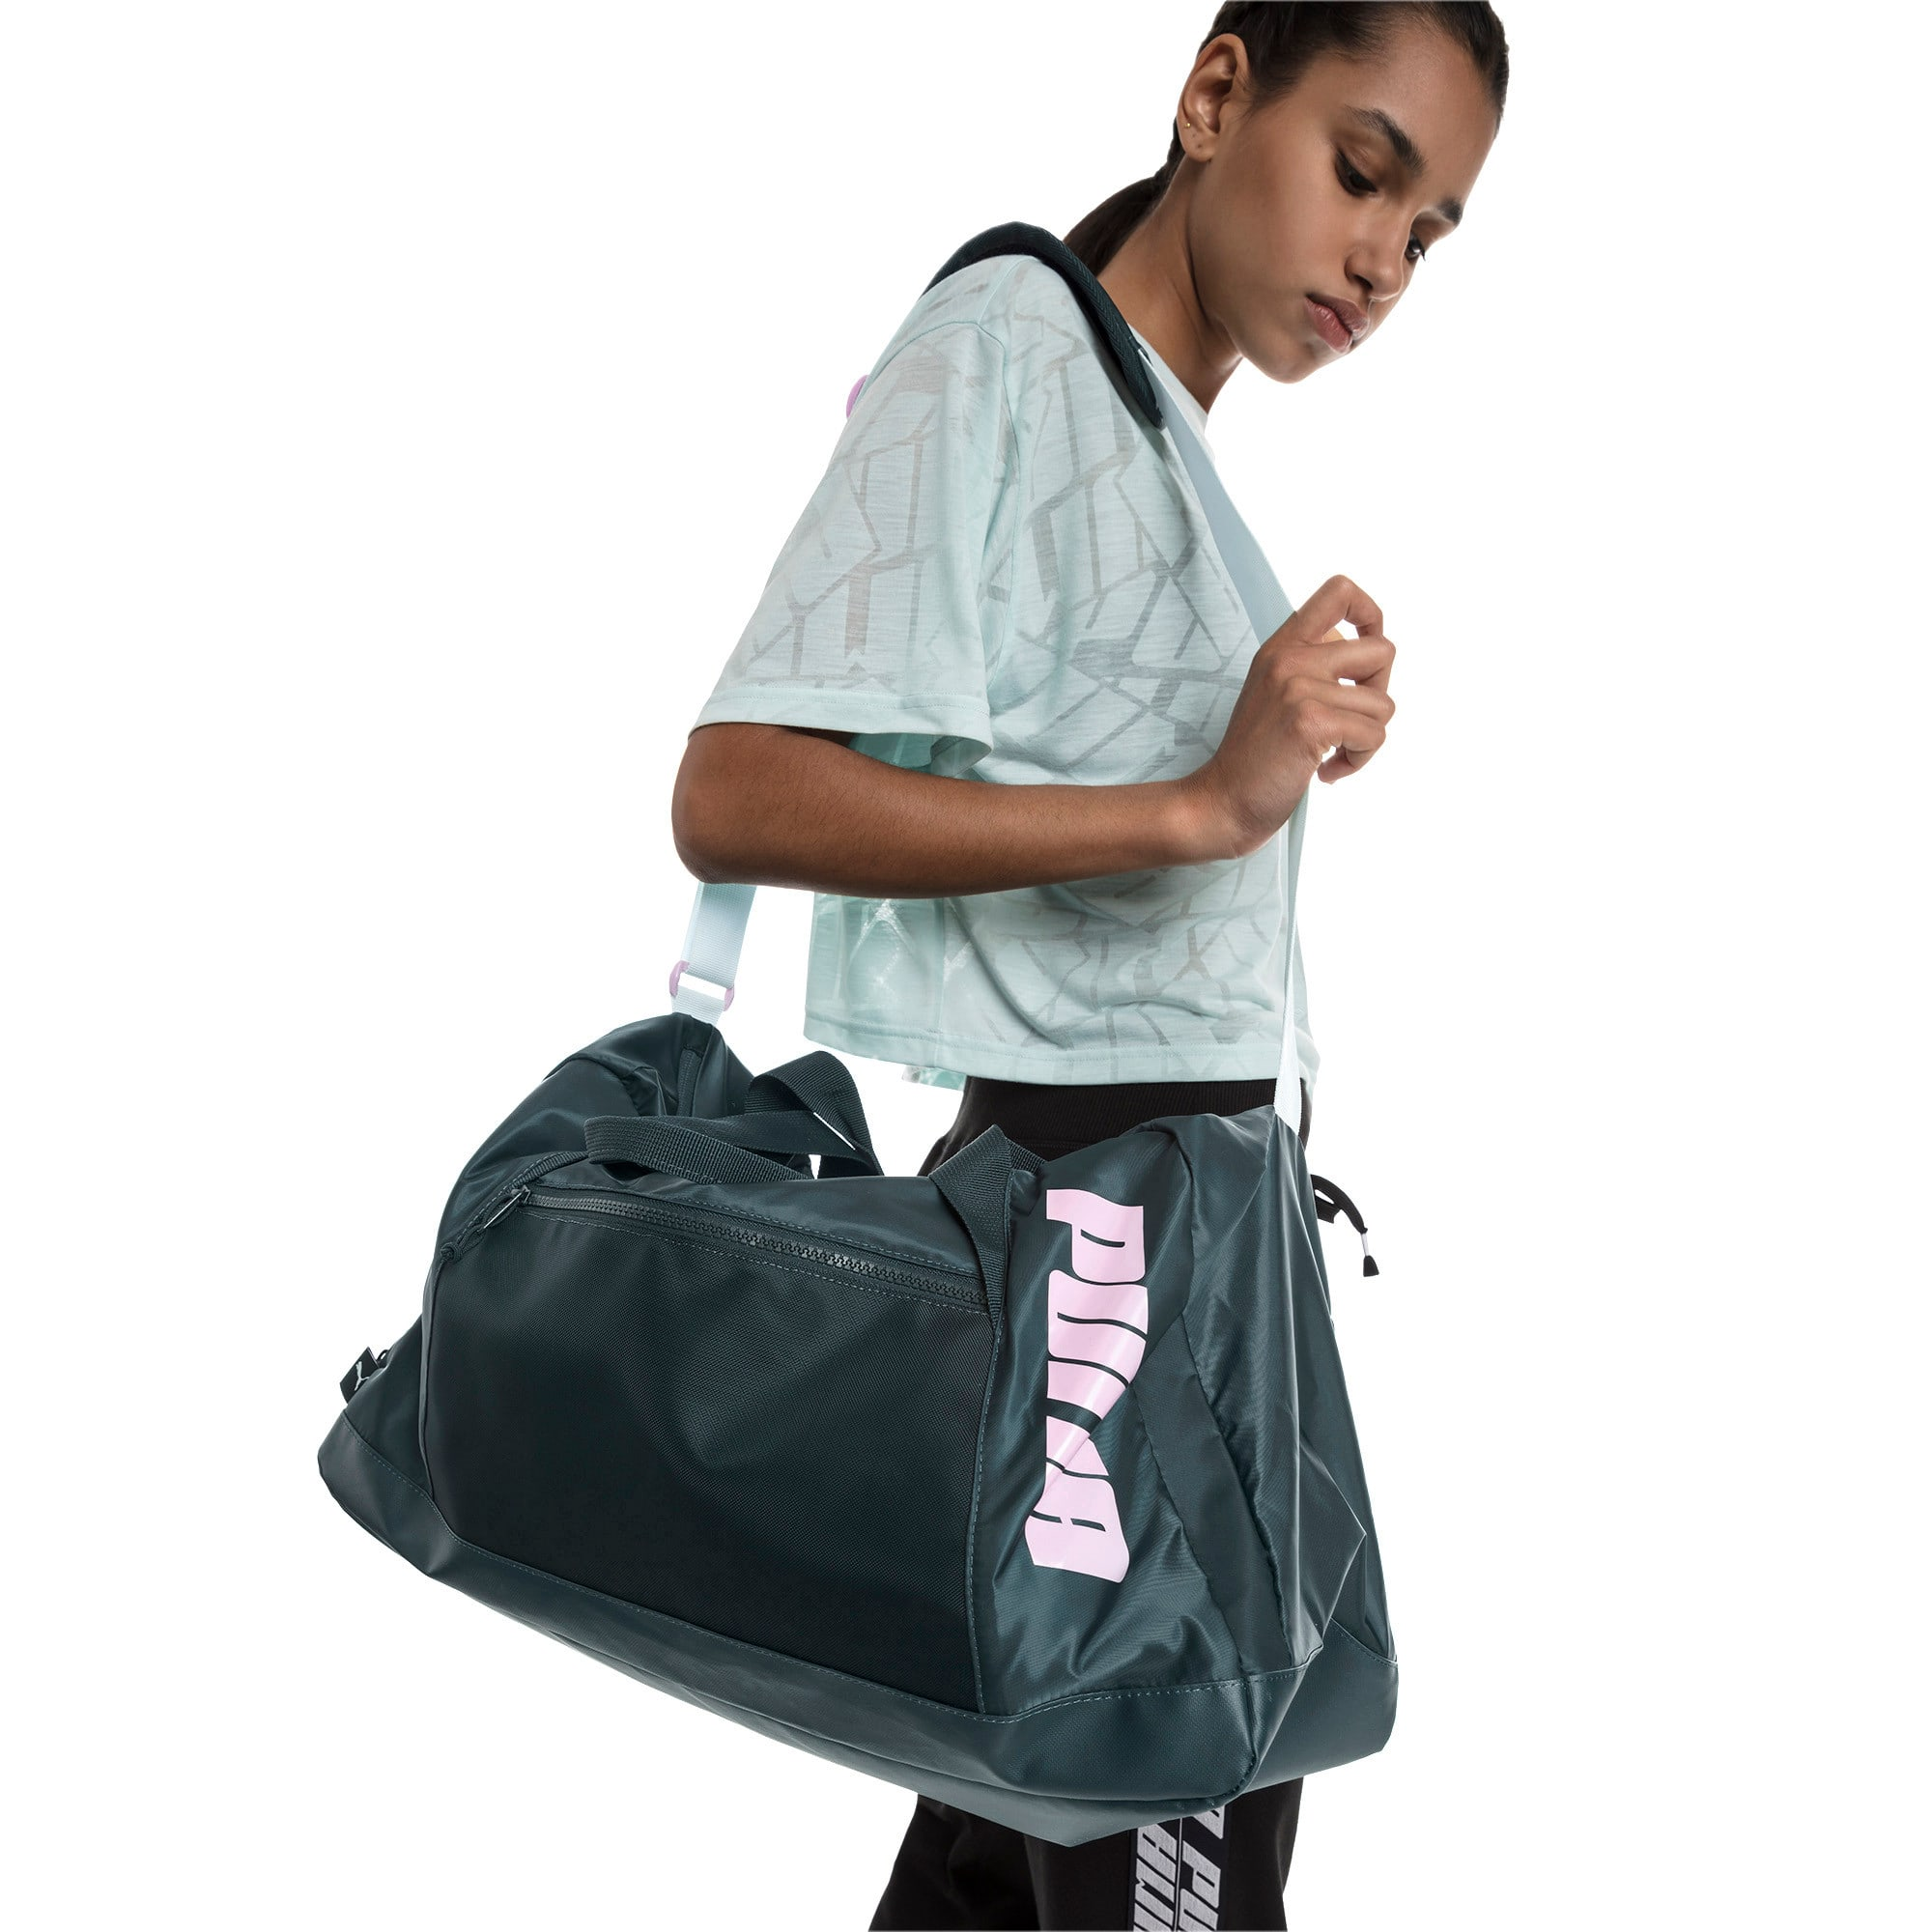 Thumbnail 2 of Active Women's Training Duffle Bag, Ponderosa Pine, medium